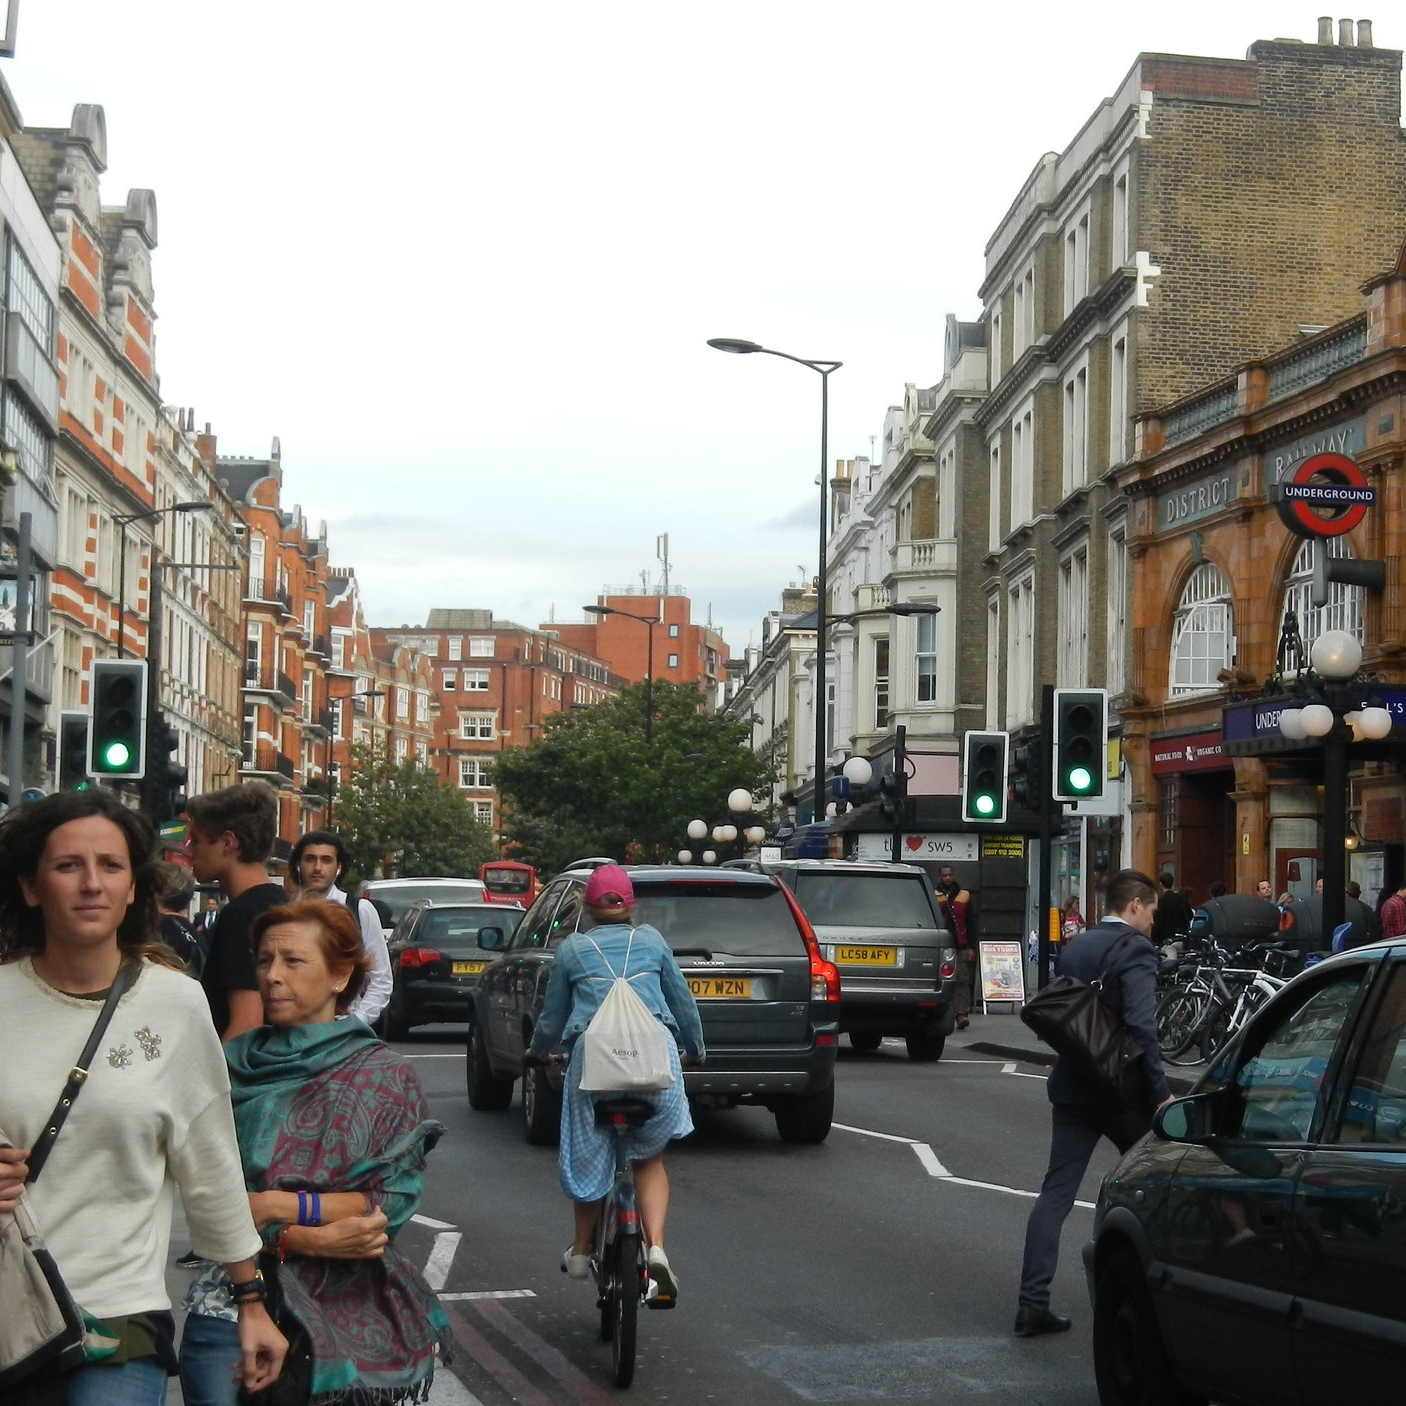 South Kensington, London by The Doubtful Traveller